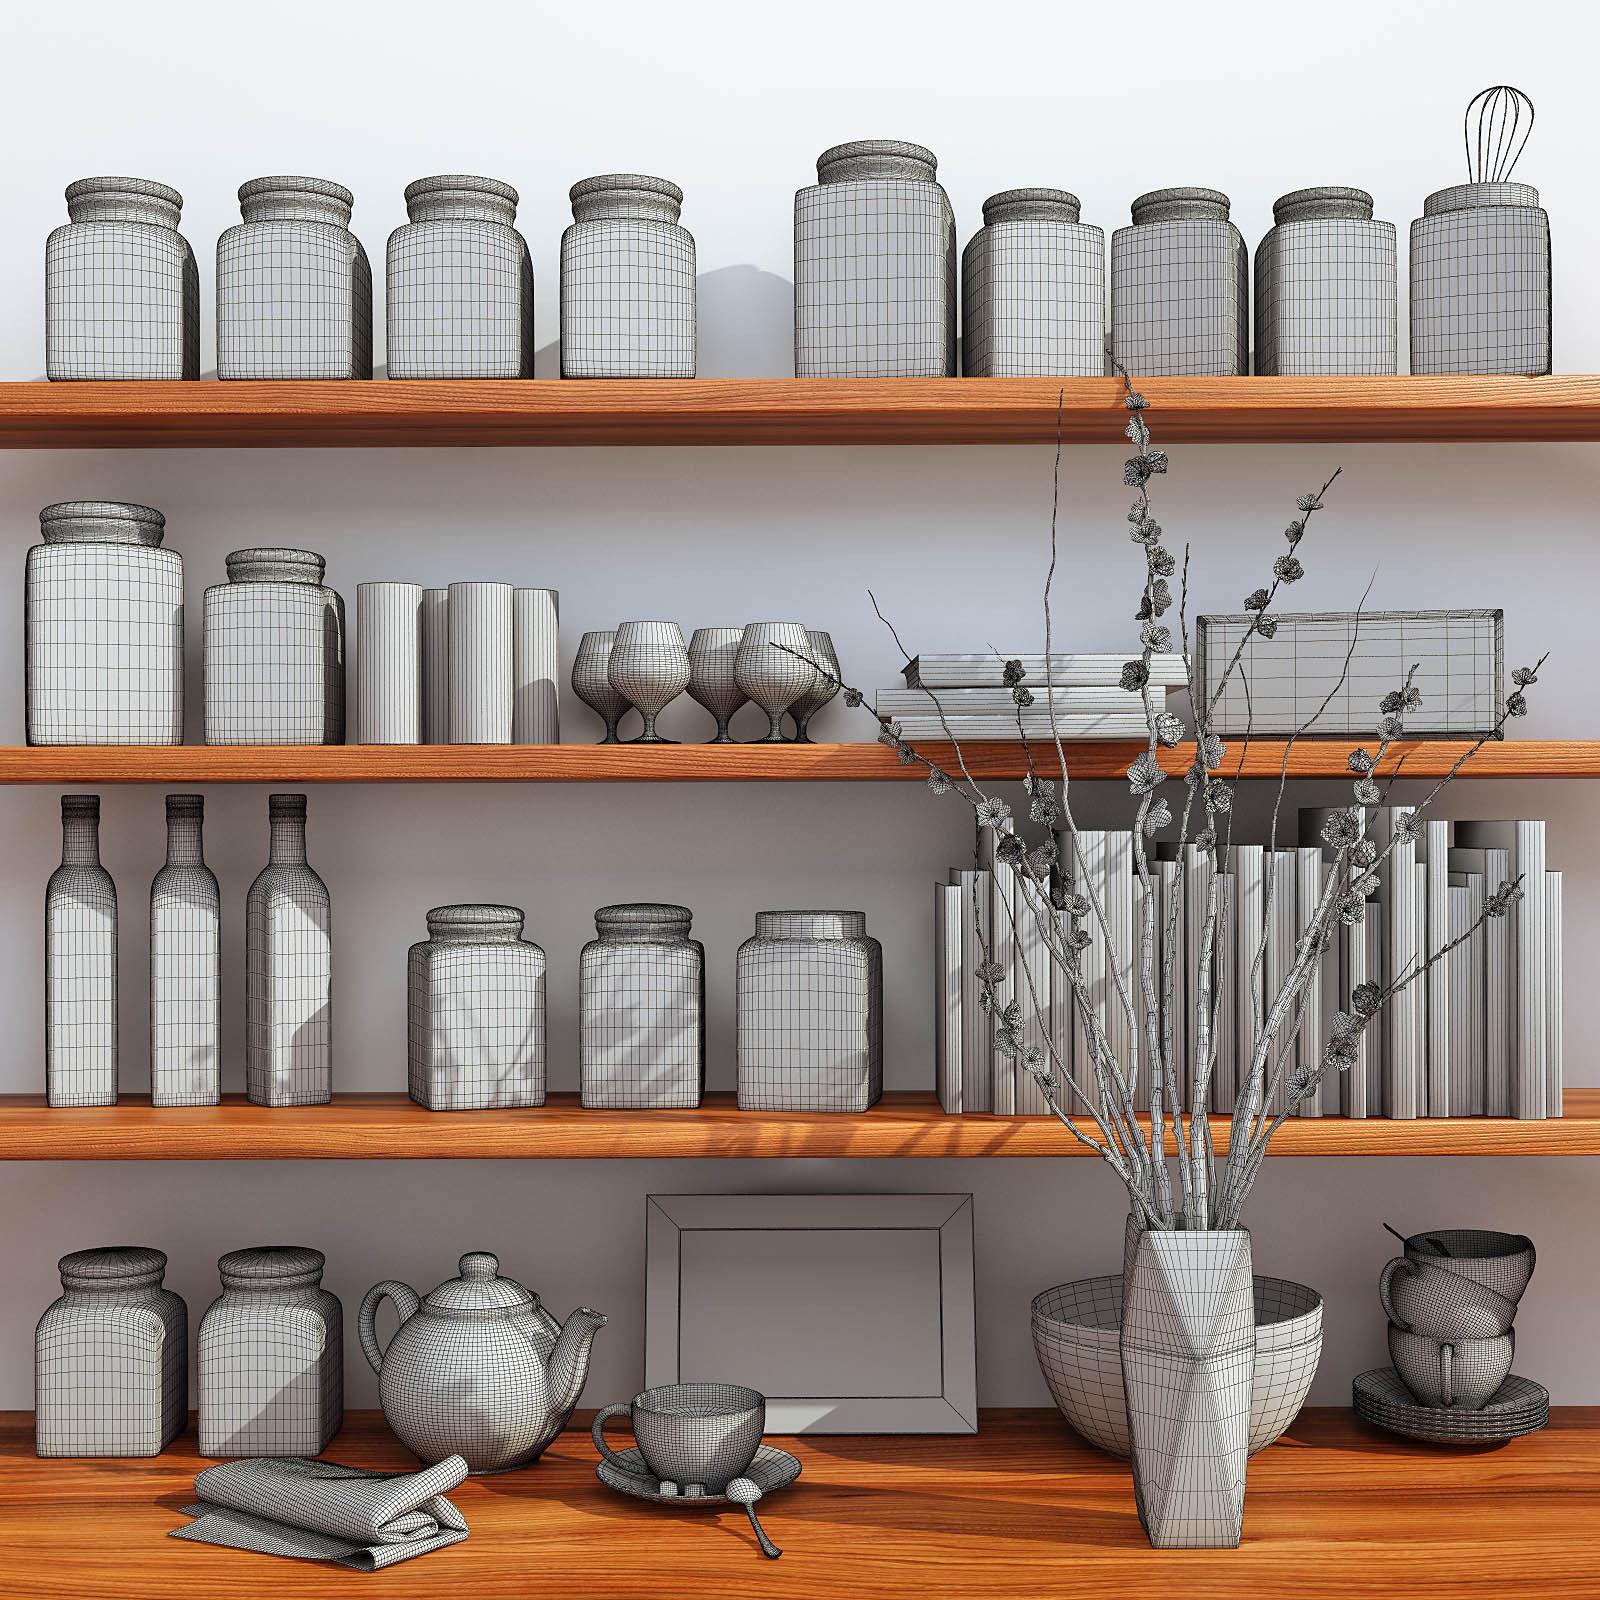 Kitchen decorative set 3d model max fbx for Kitchen set 3d warehouse